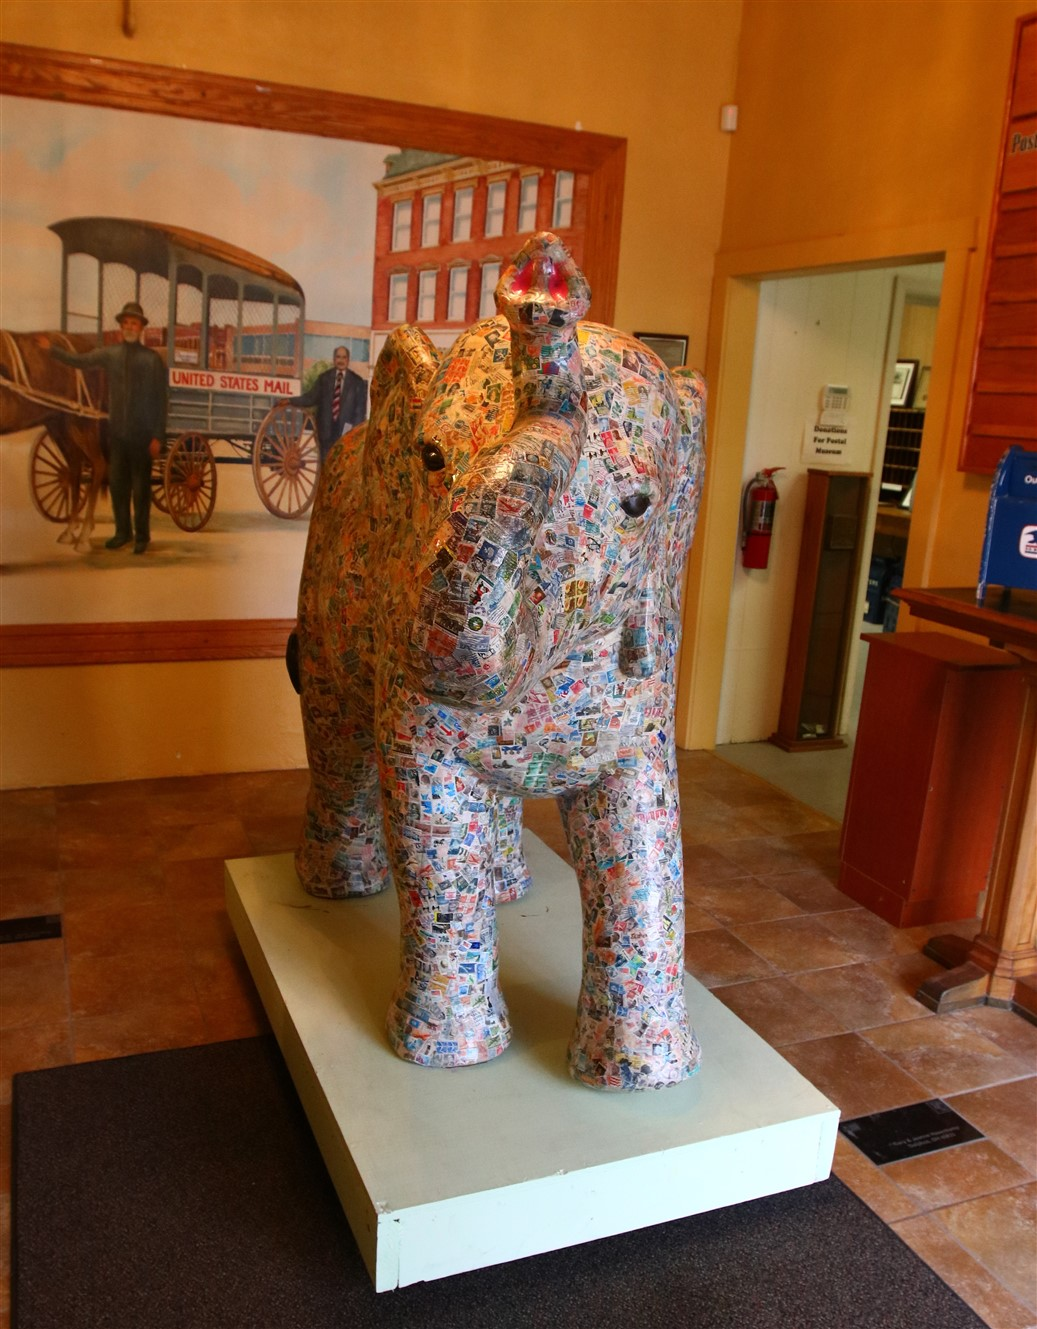 2017 03 18 226 Delphos OH Postal Museum.jpg